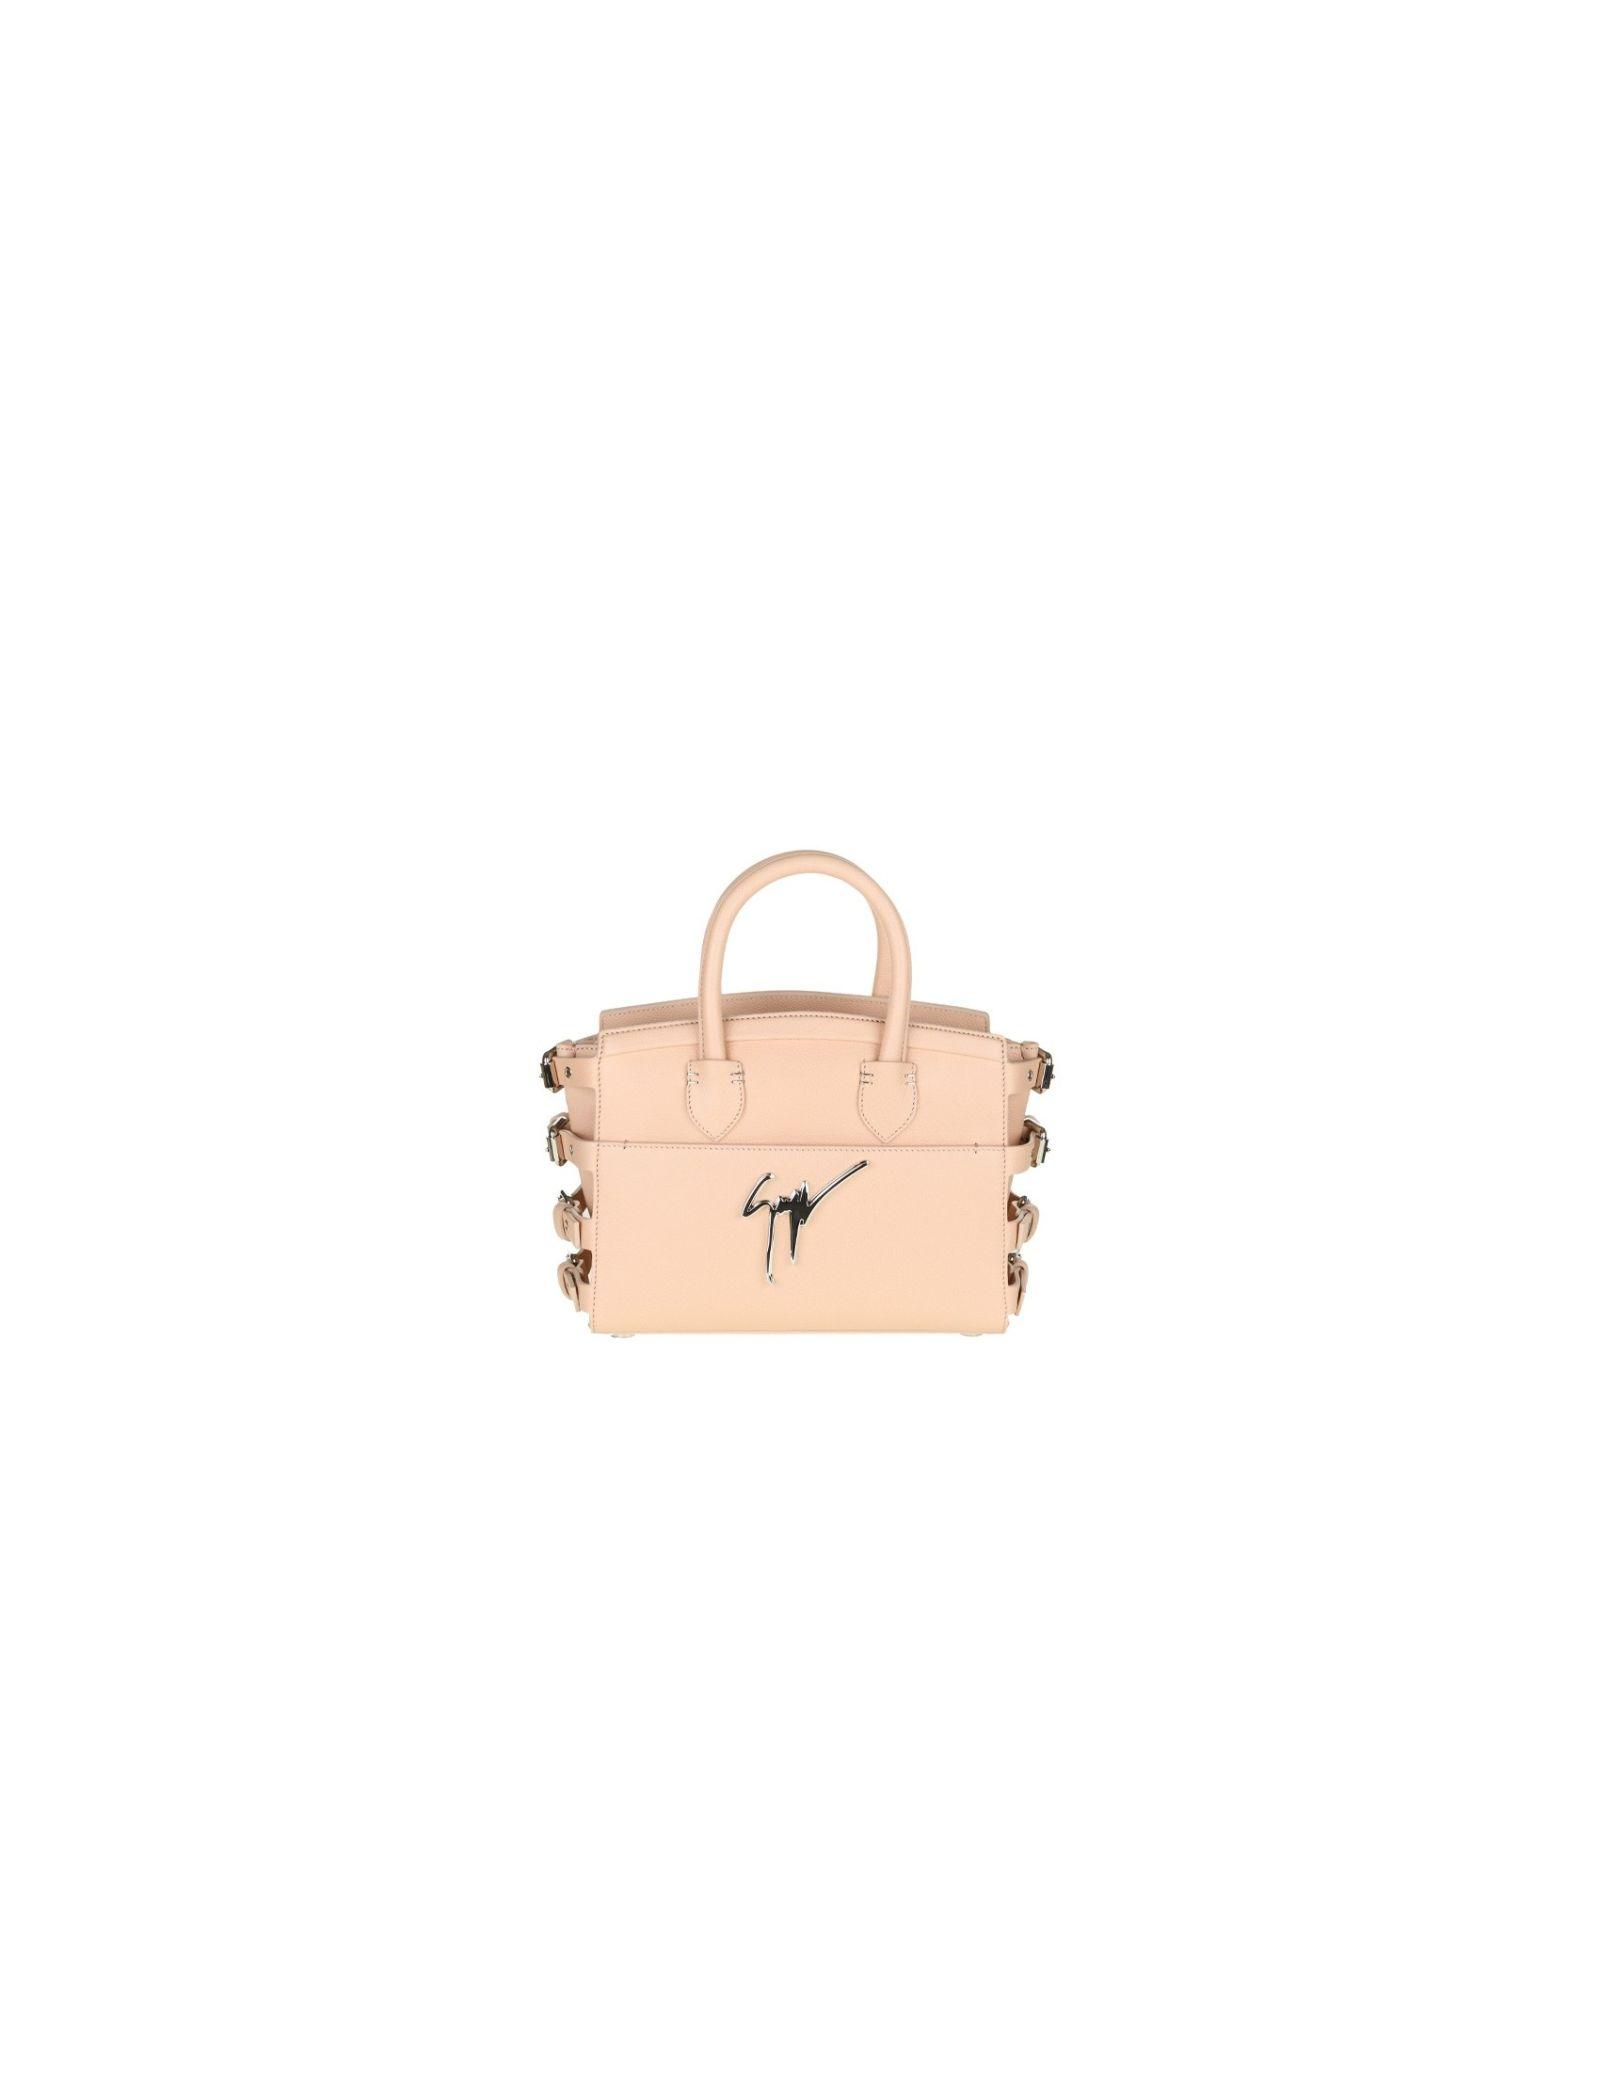 Giuseppe Zanotti Totes Giuseppe Zanotti Pink  Tote Bag G17